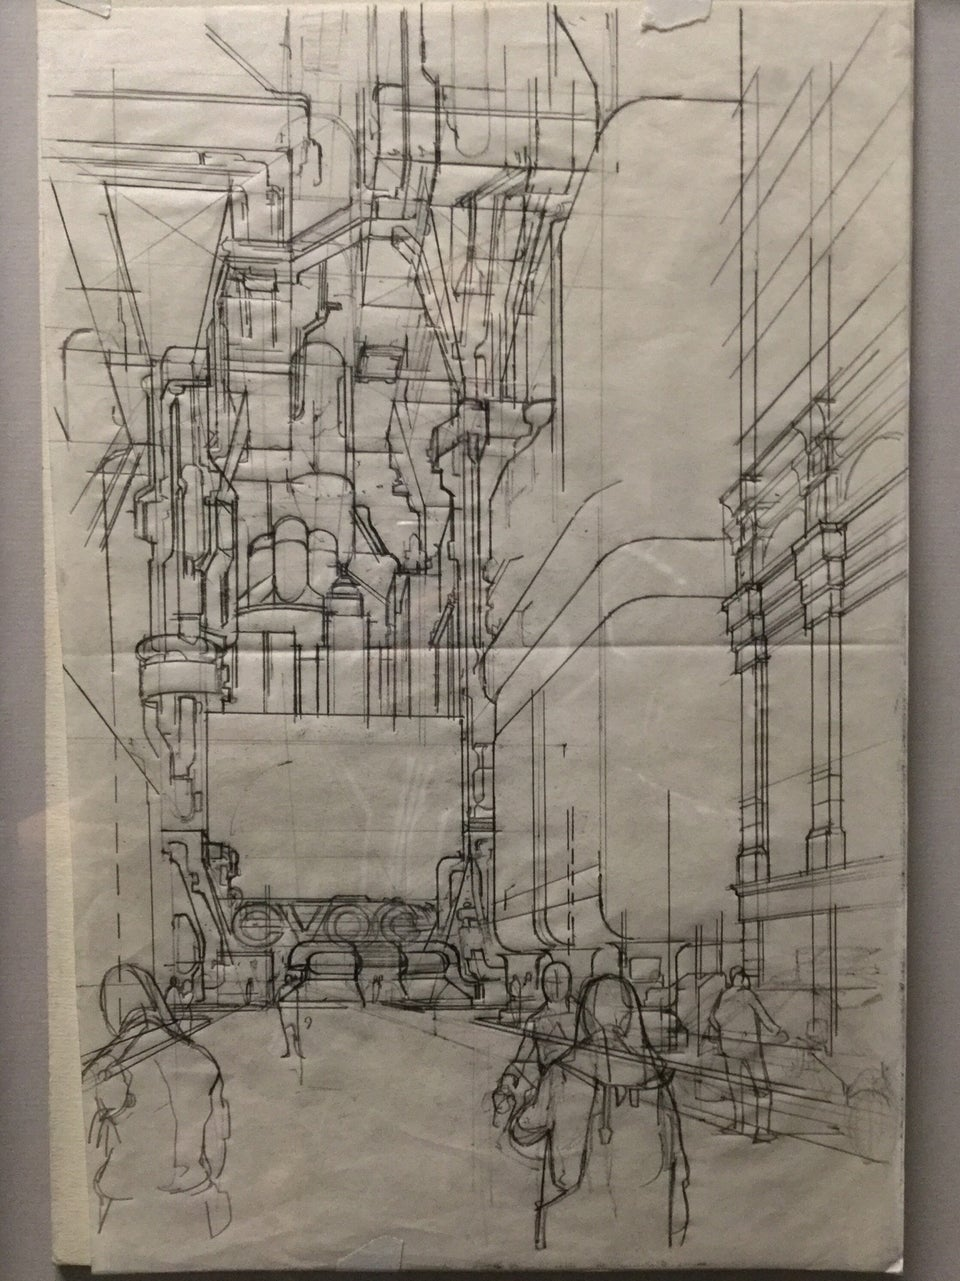 Line art drawing of a future urban street scene.